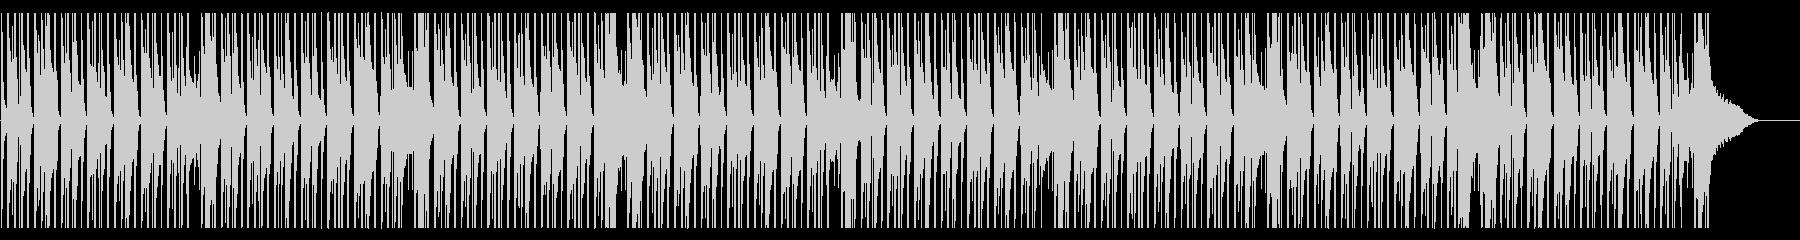 CMやアニメ系の日常(マリンバ)の未再生の波形